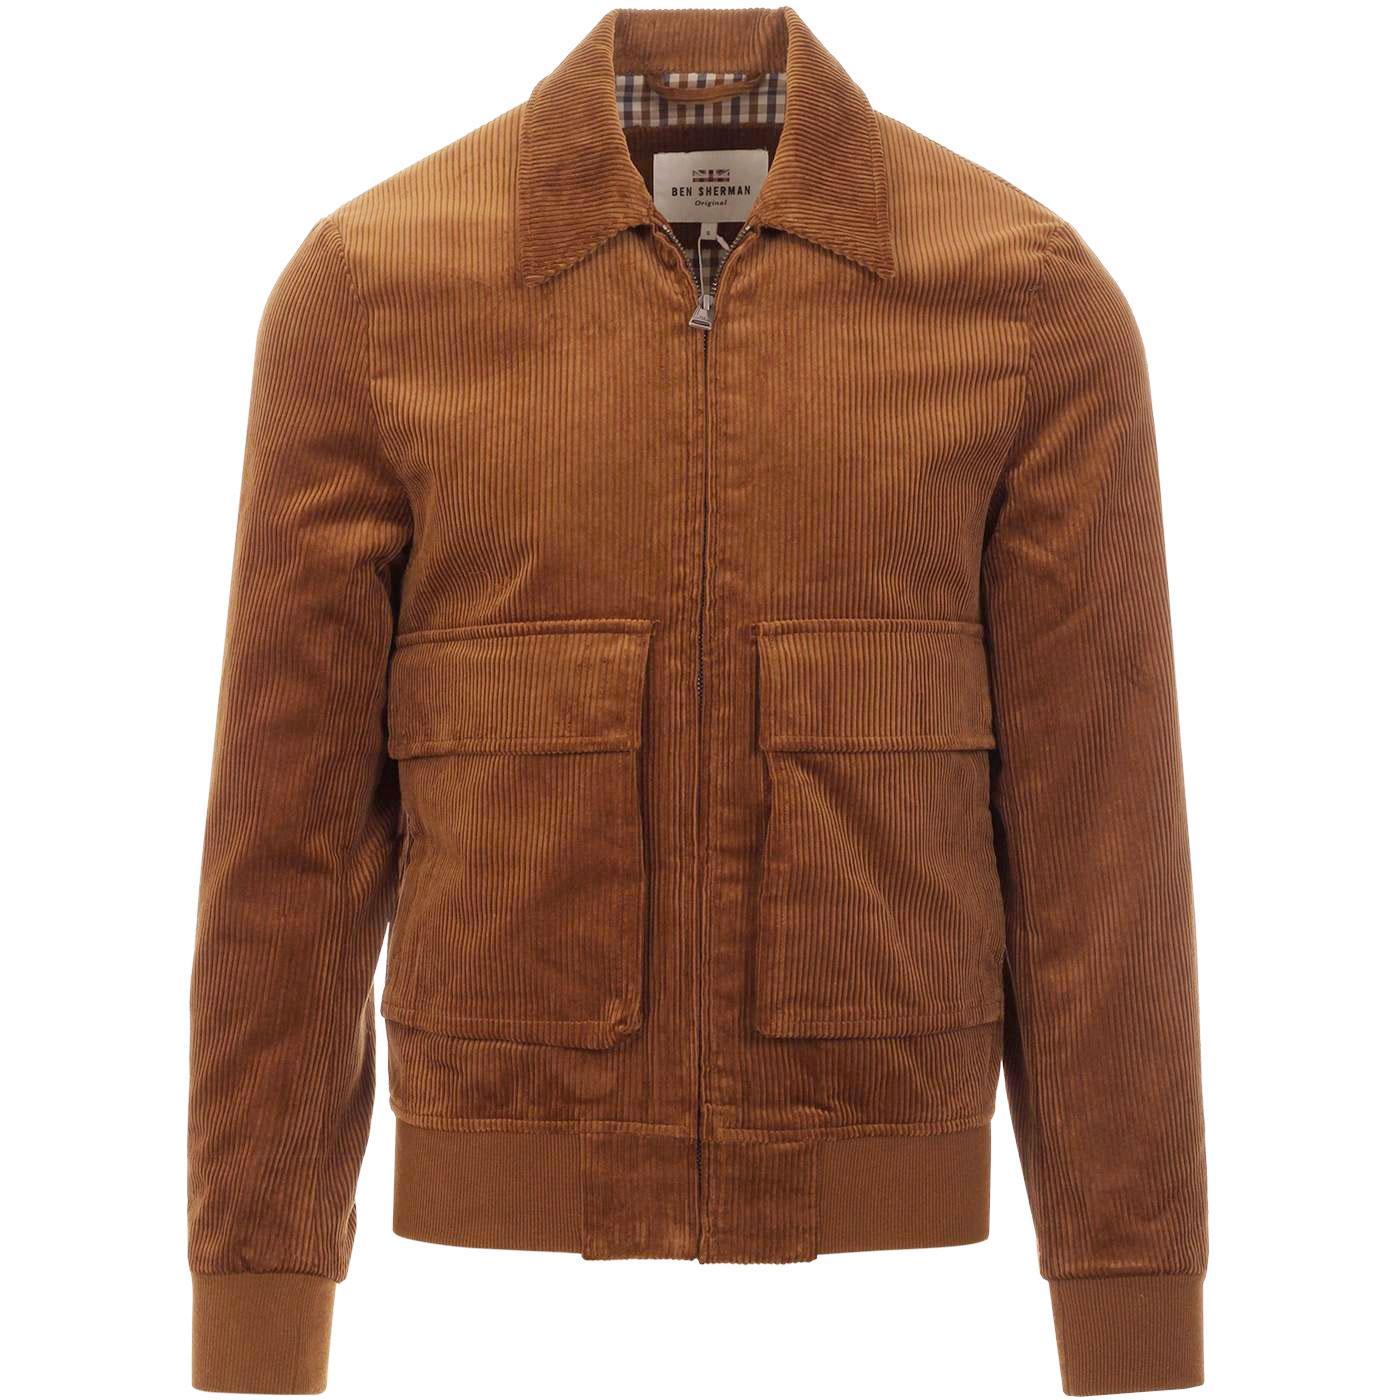 BEN SHERMAN Men's Retro Cord Harrington Jacket TAN